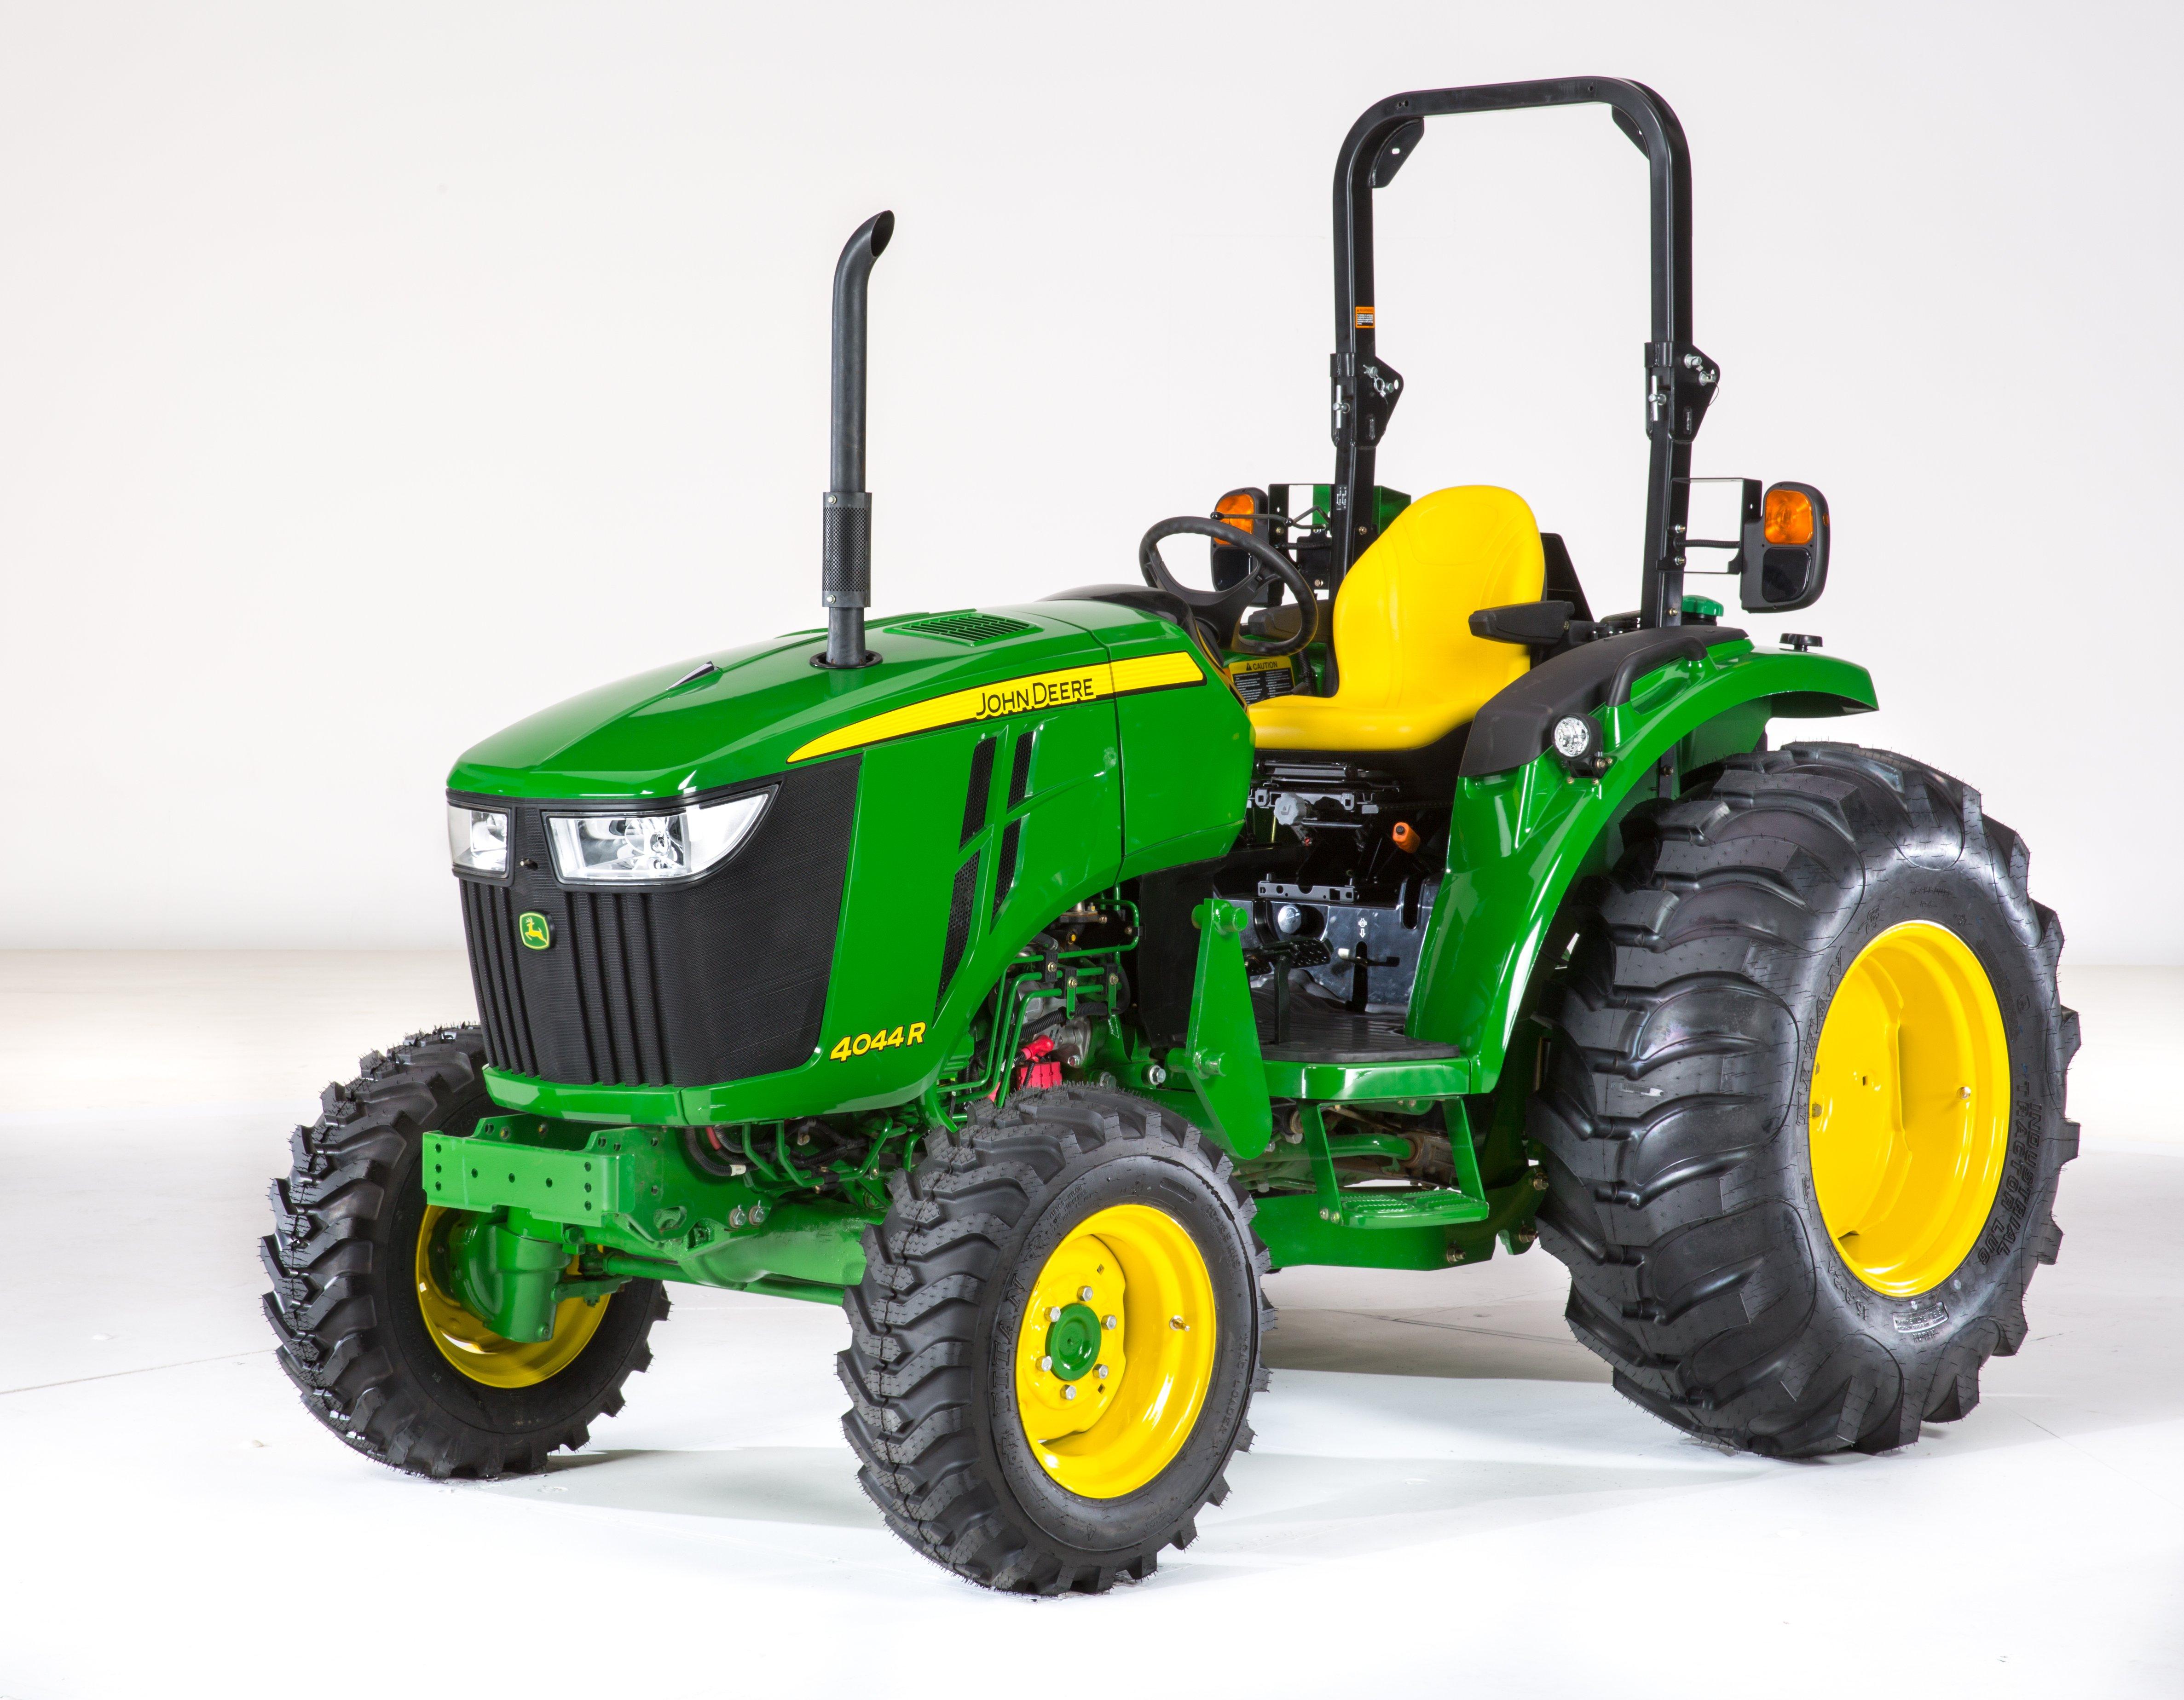 John Deere Intros 6 Compact Utility Tractors